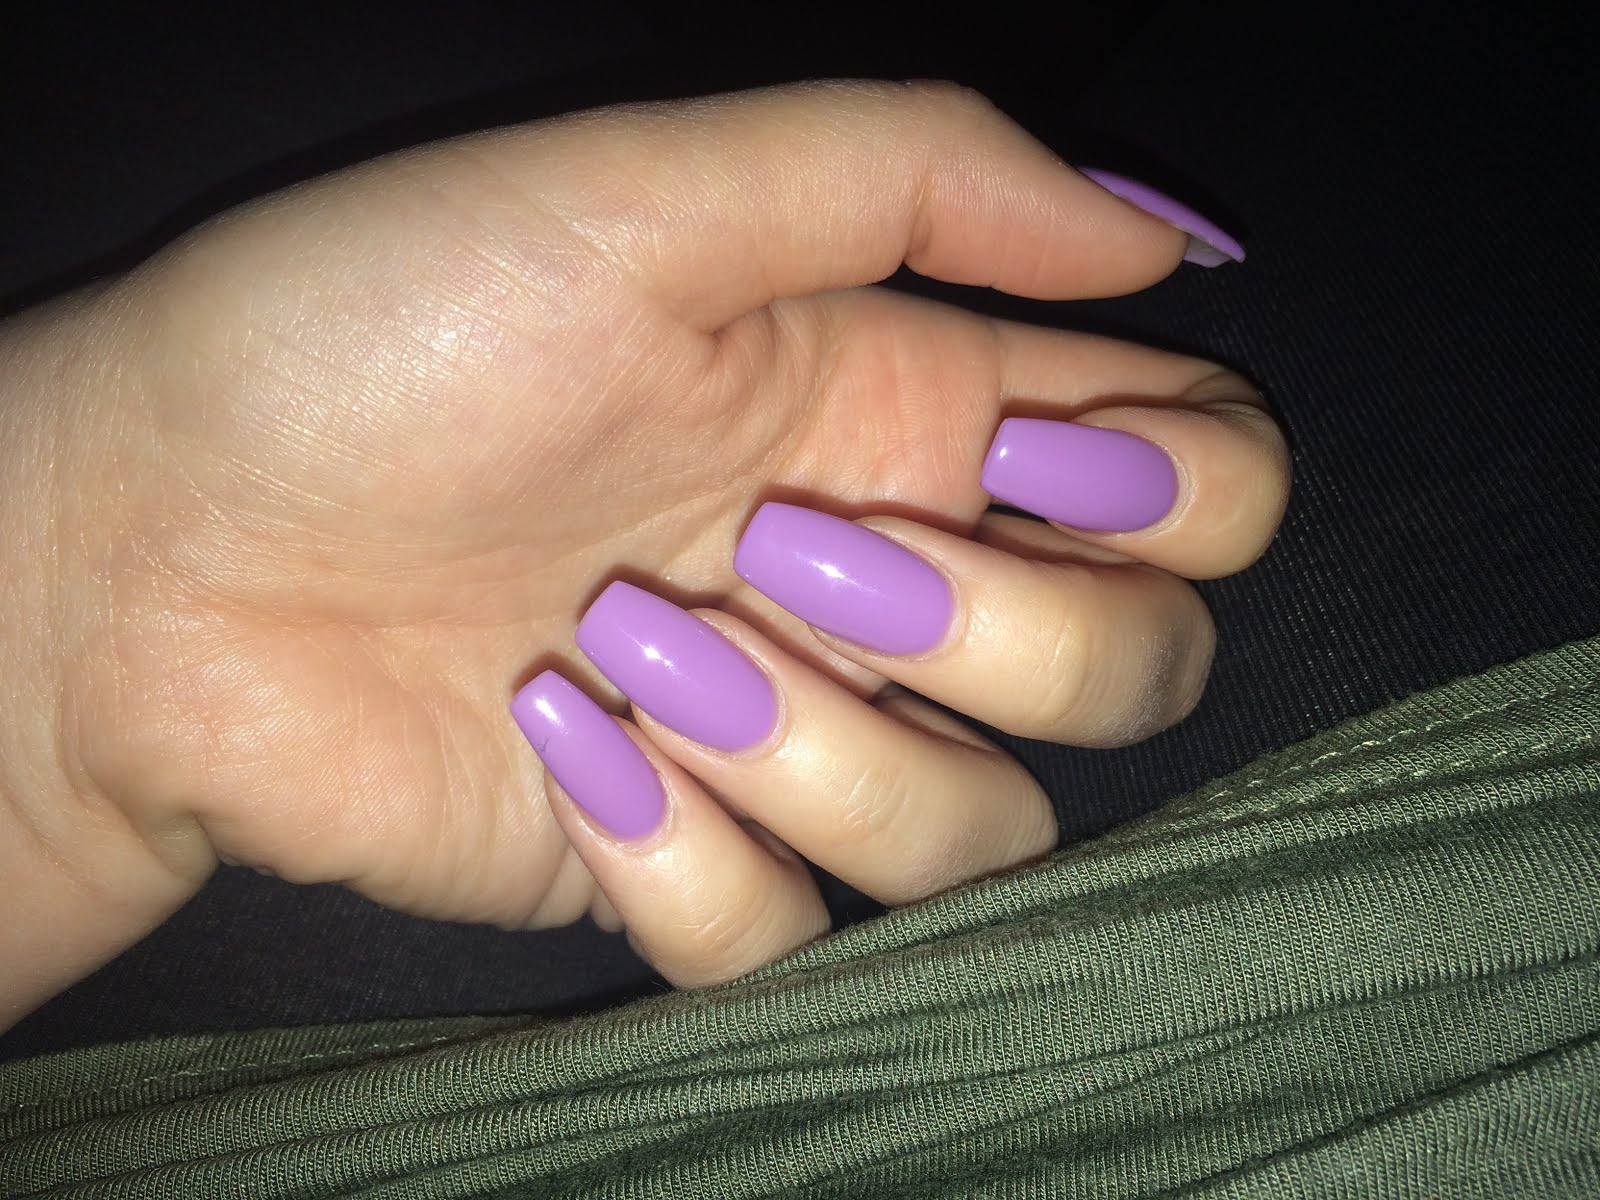 Lovely lavender nails - Fickle & Fake